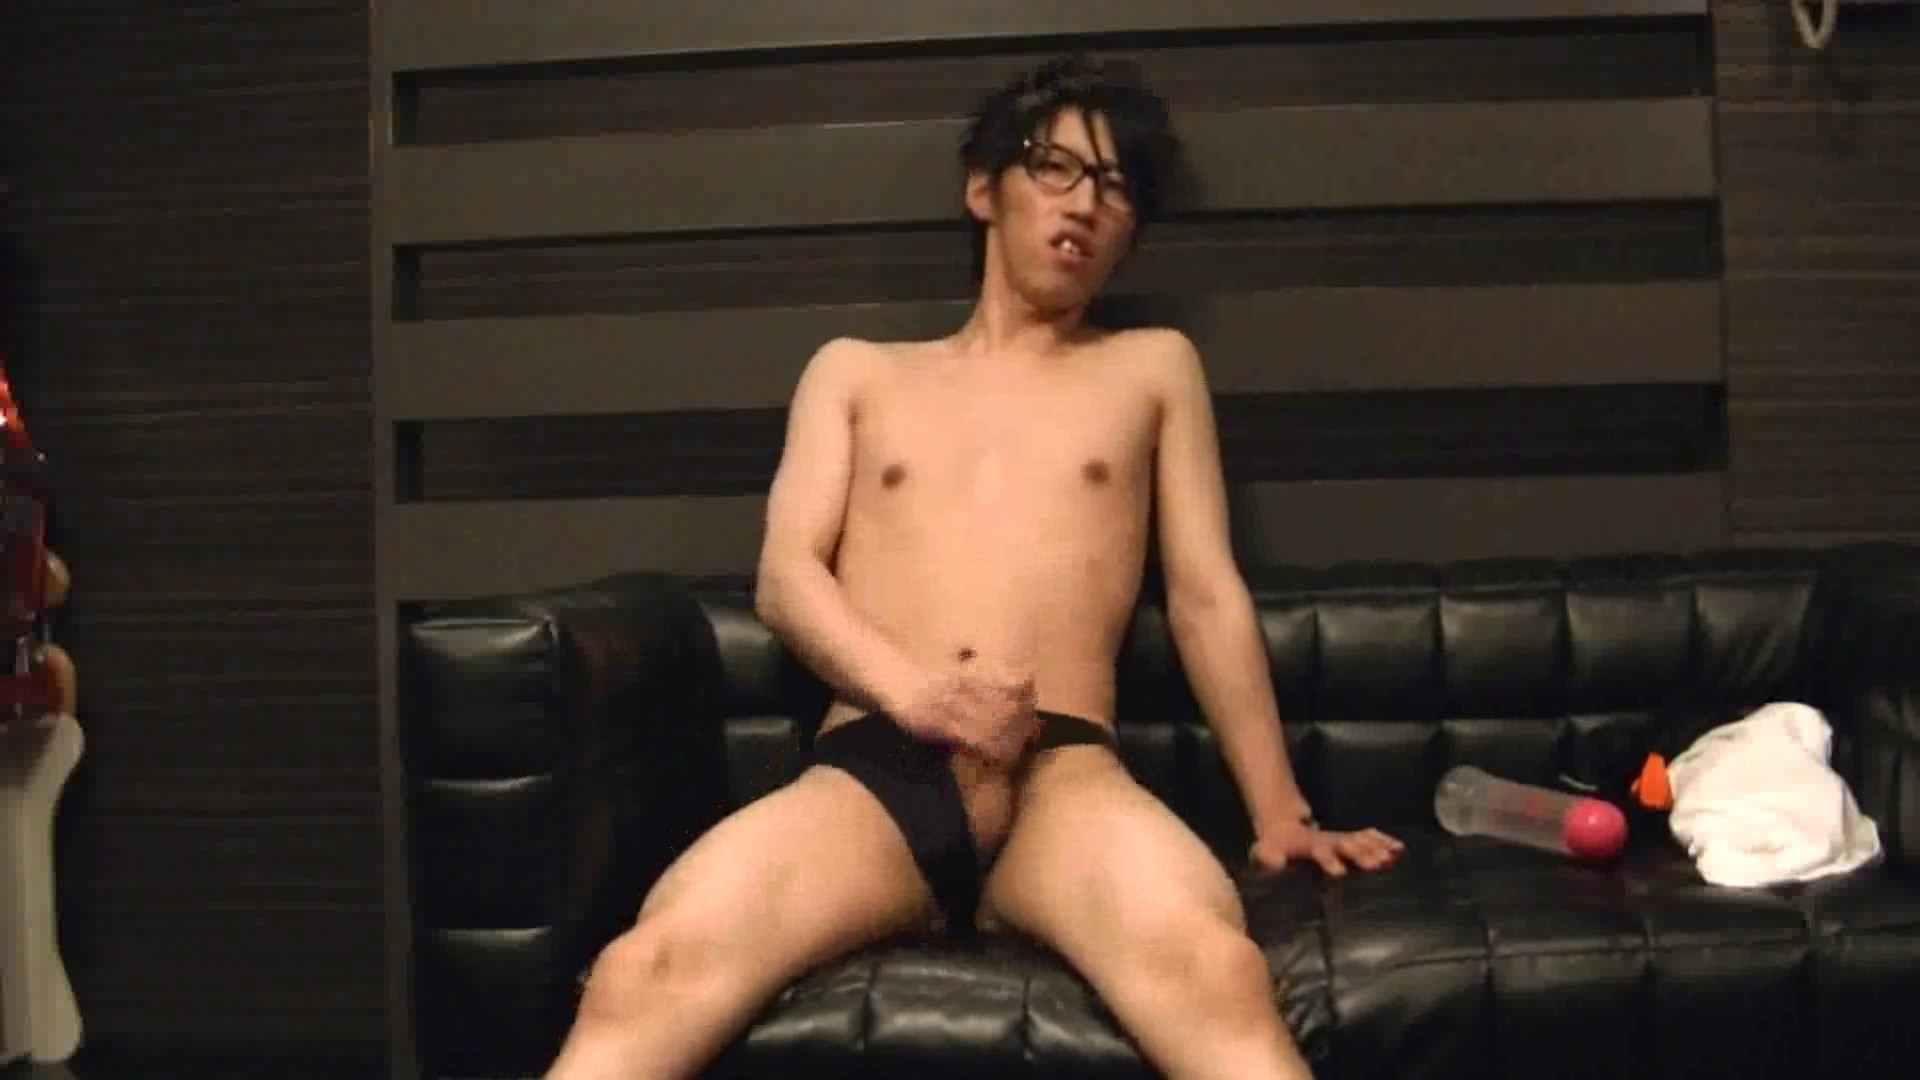 ONA見せカーニバル!! Vol3 男  93pic 80